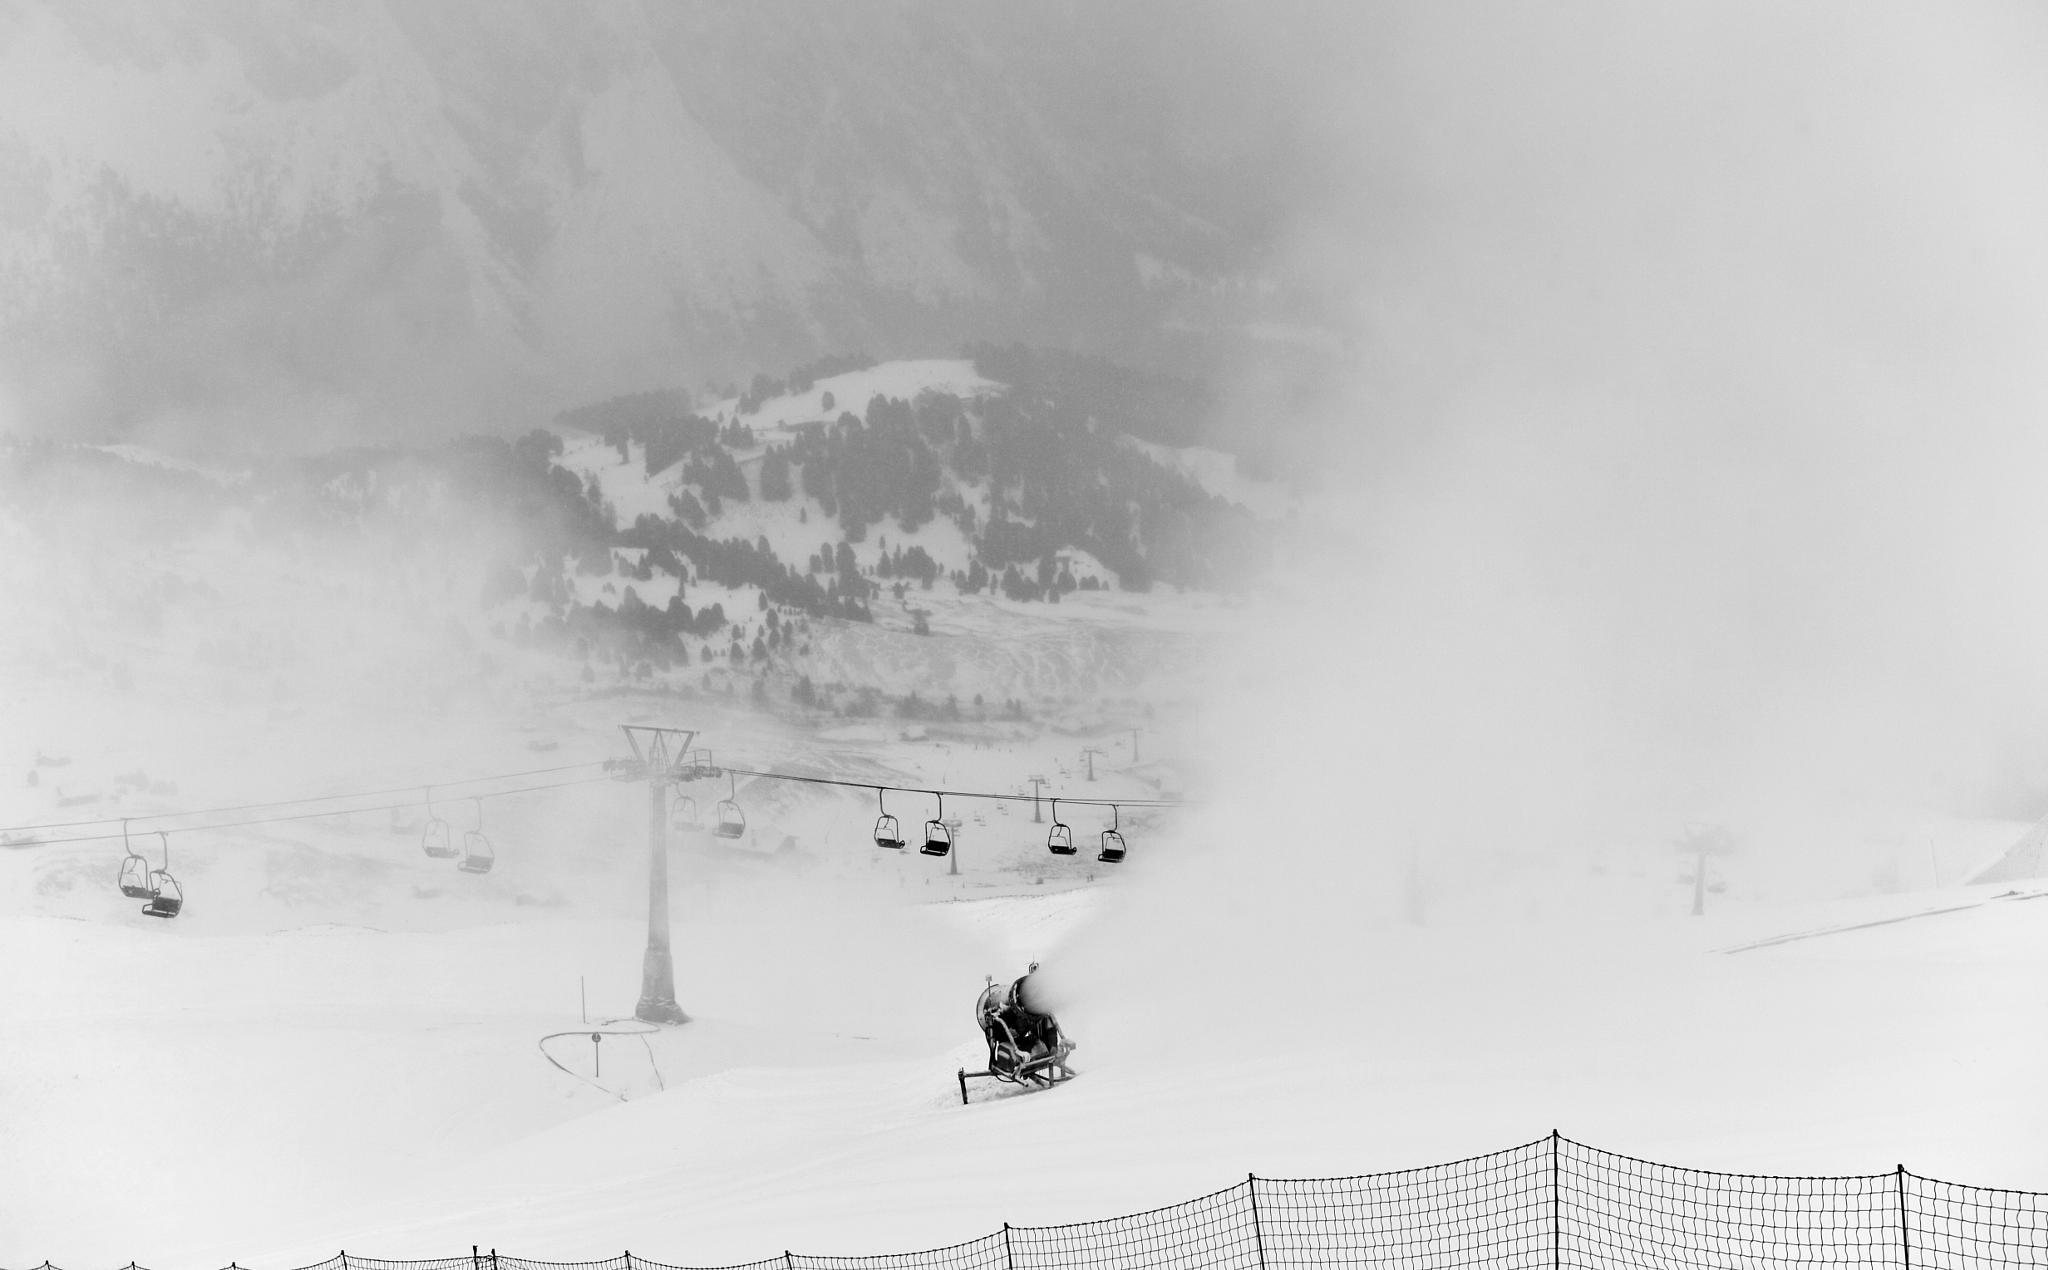 snowmaker by maurizio senoner